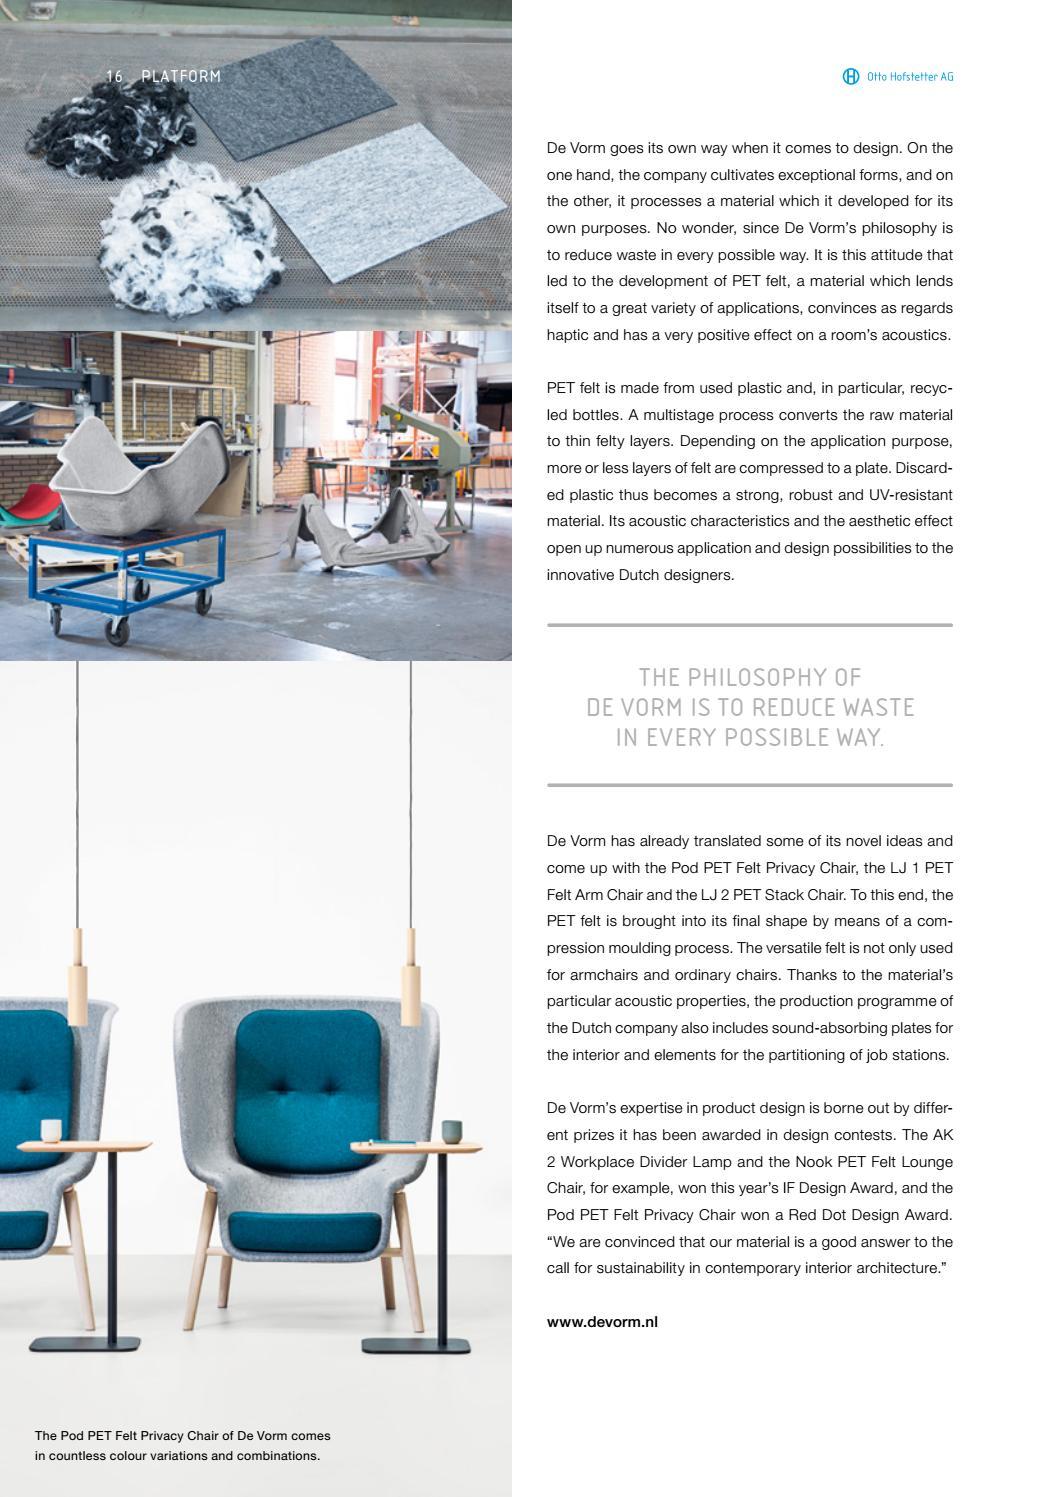 Otto Hofstetter Customer Magazine Nr (View 9 of 15)